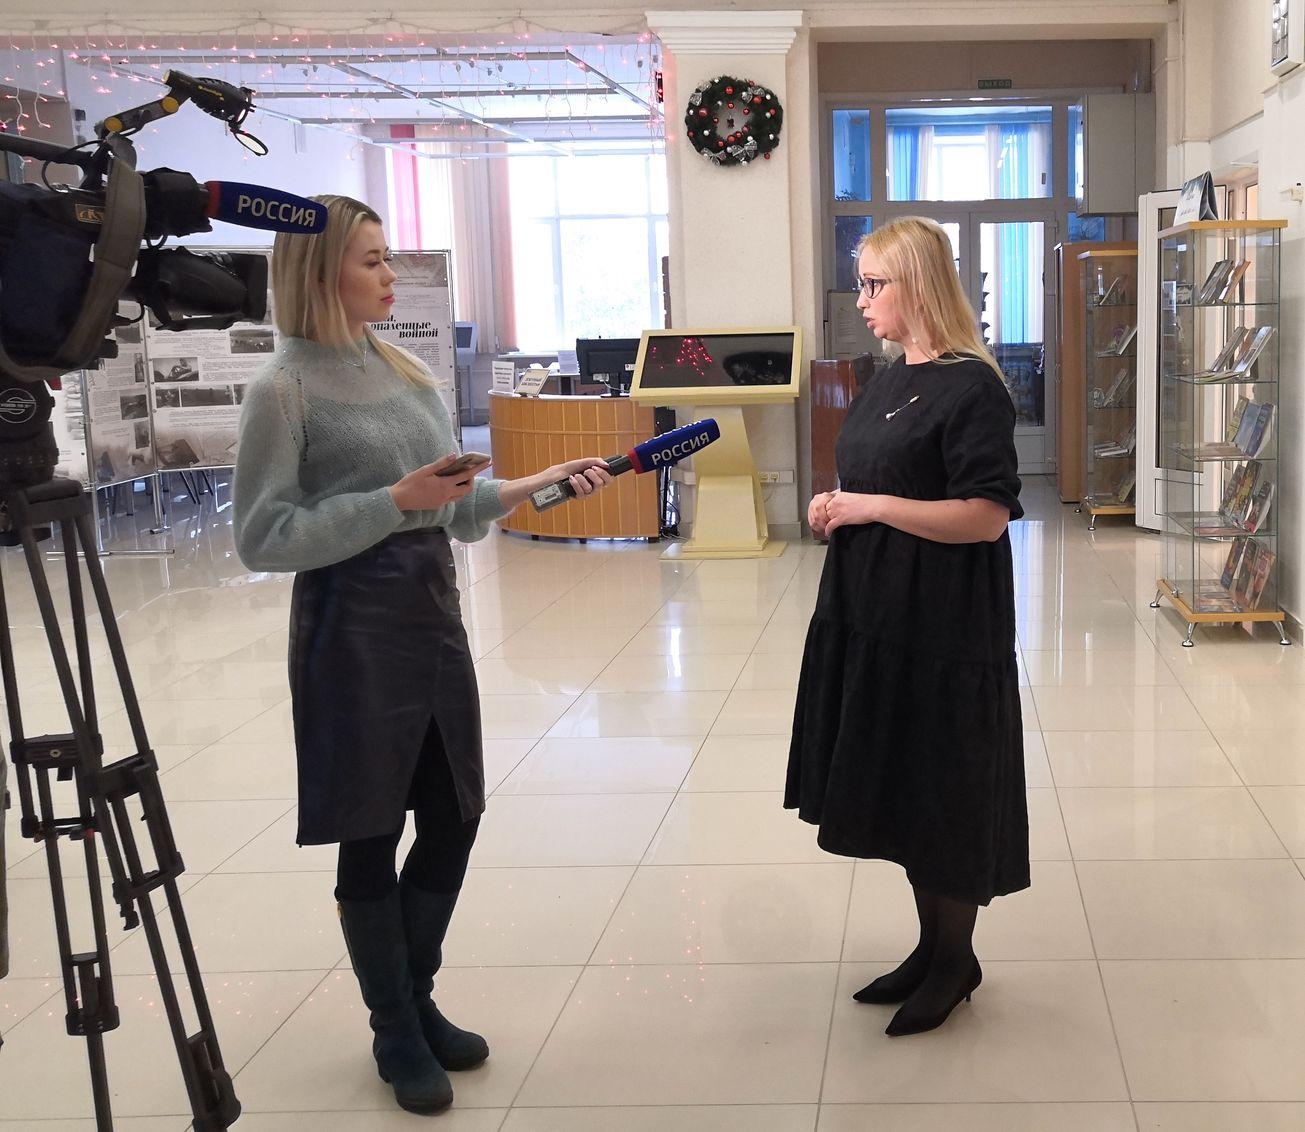 Интервью дает Алиса Бирюкова